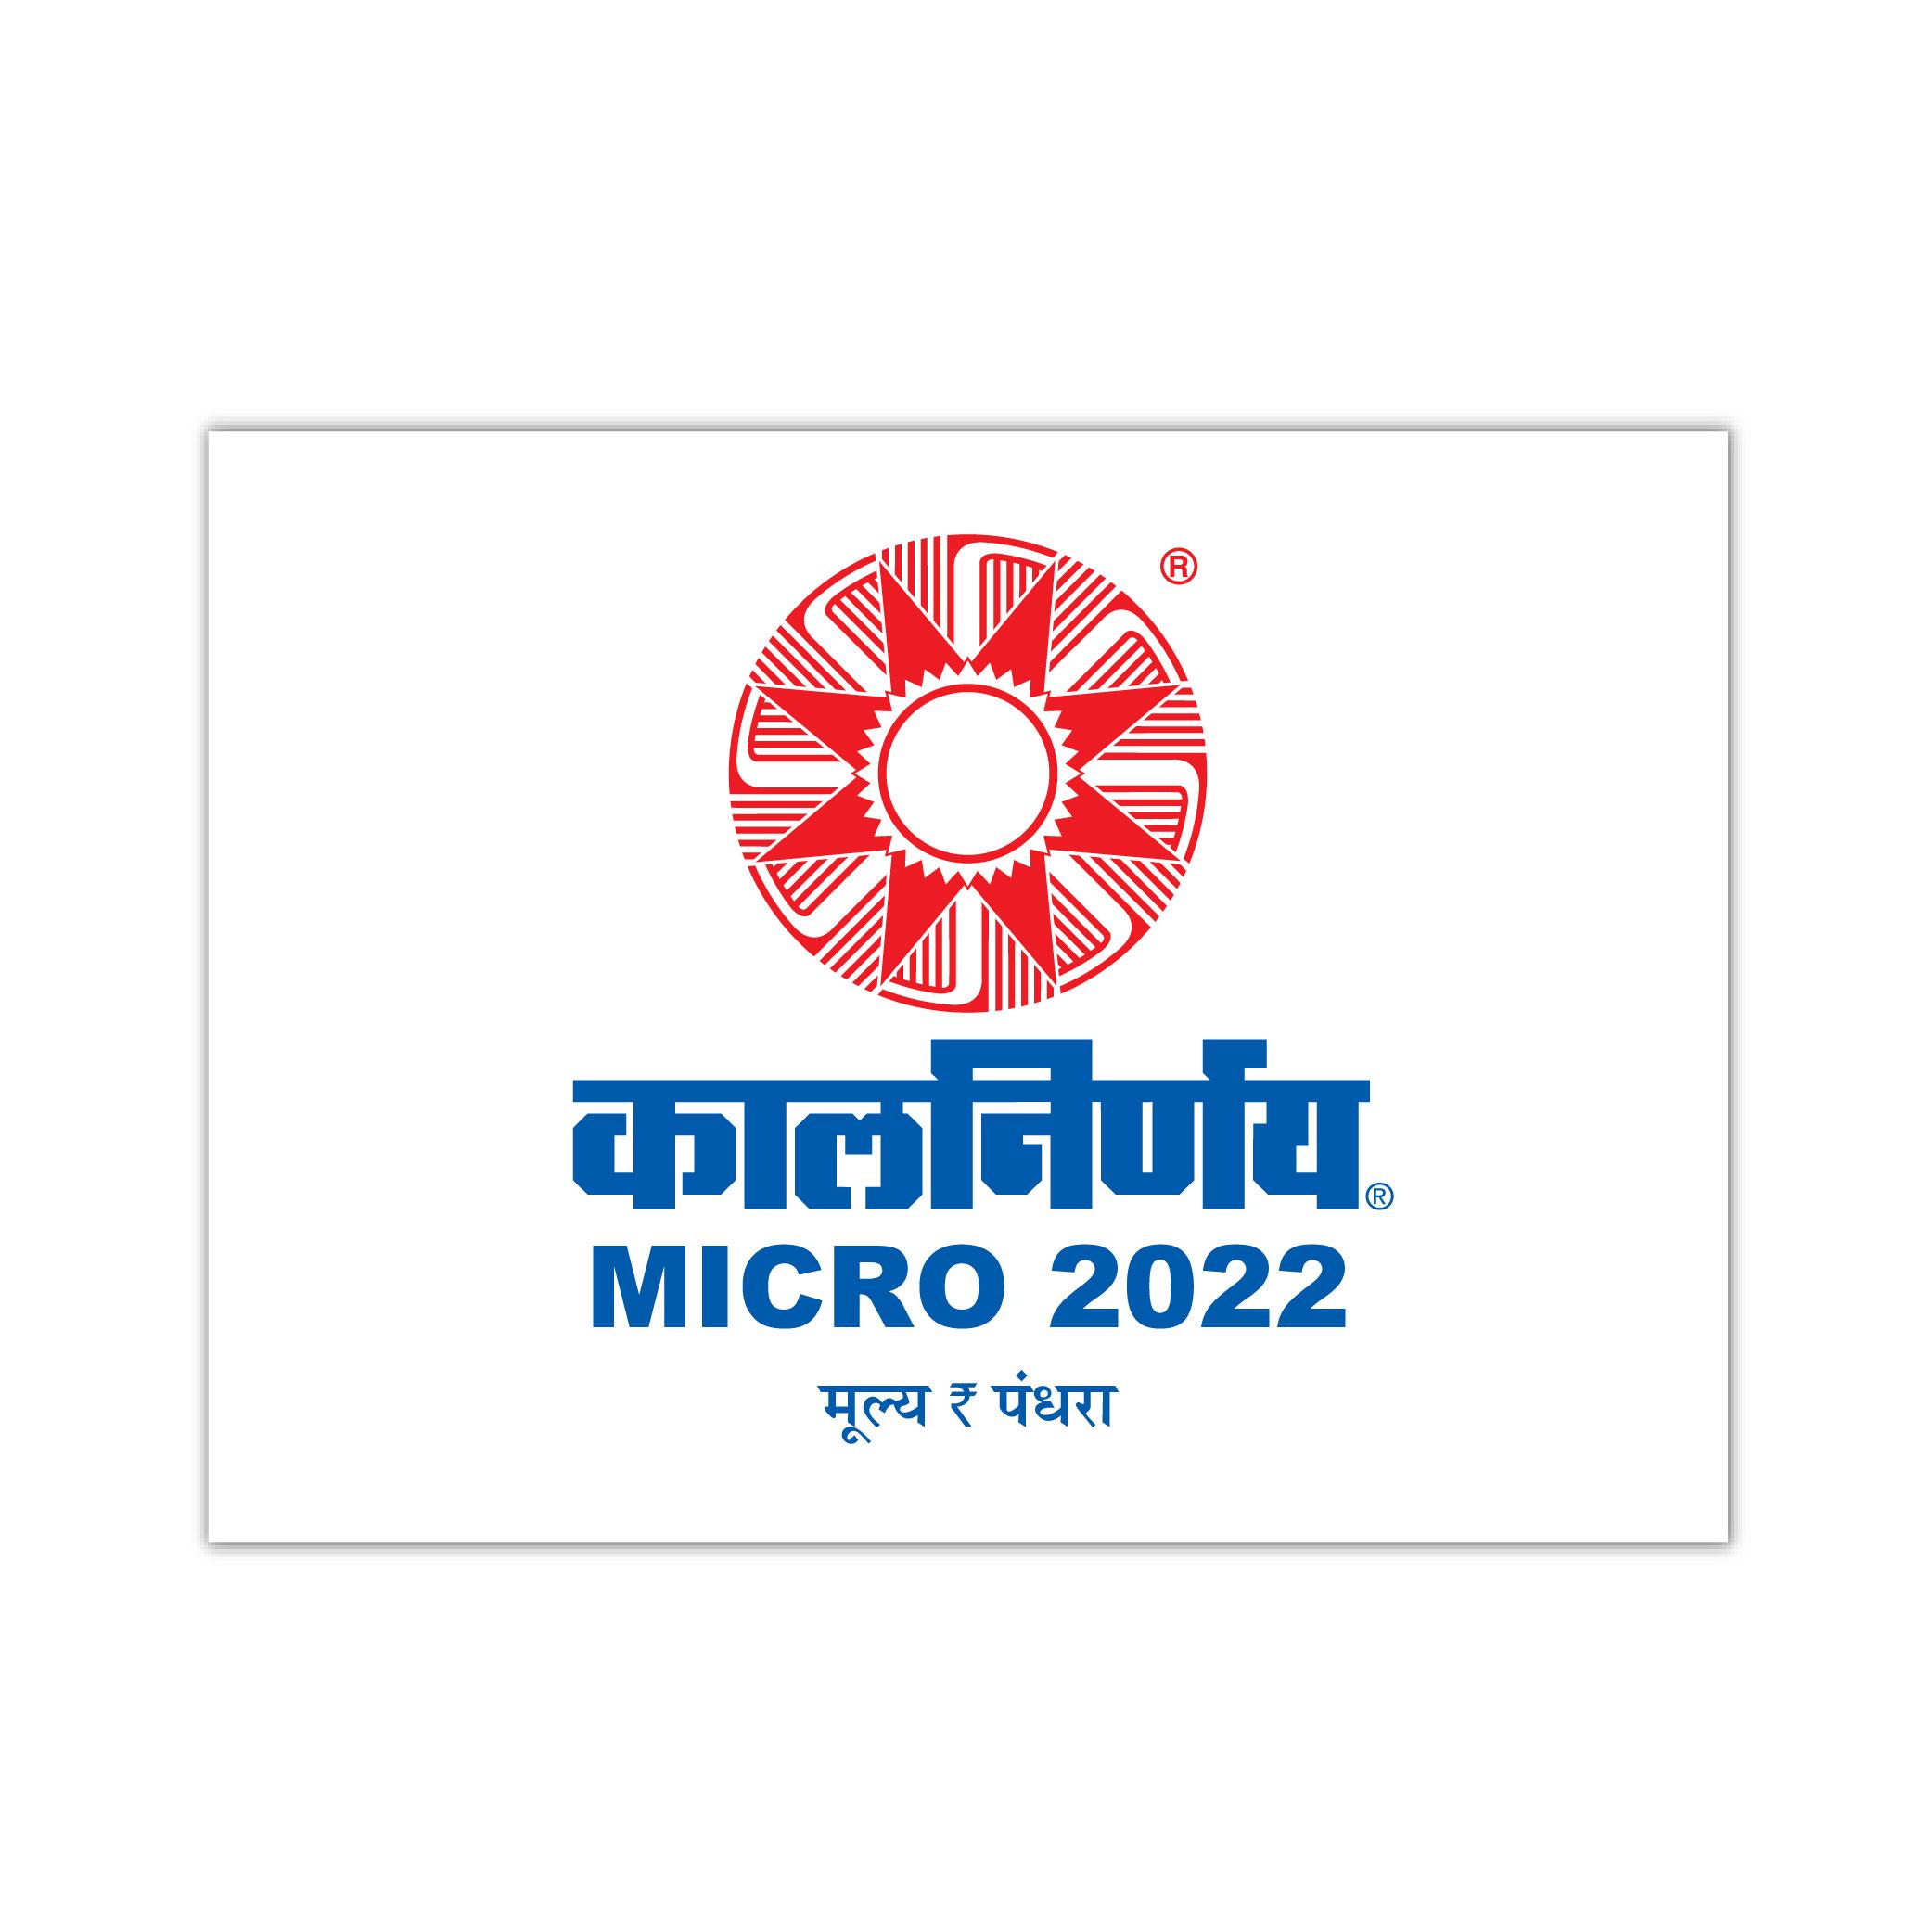 2022 Micro   Micro 2022   Micro Diary   Diary 2022   Diary for 2022   2022 Diary   2022 Diary Planner